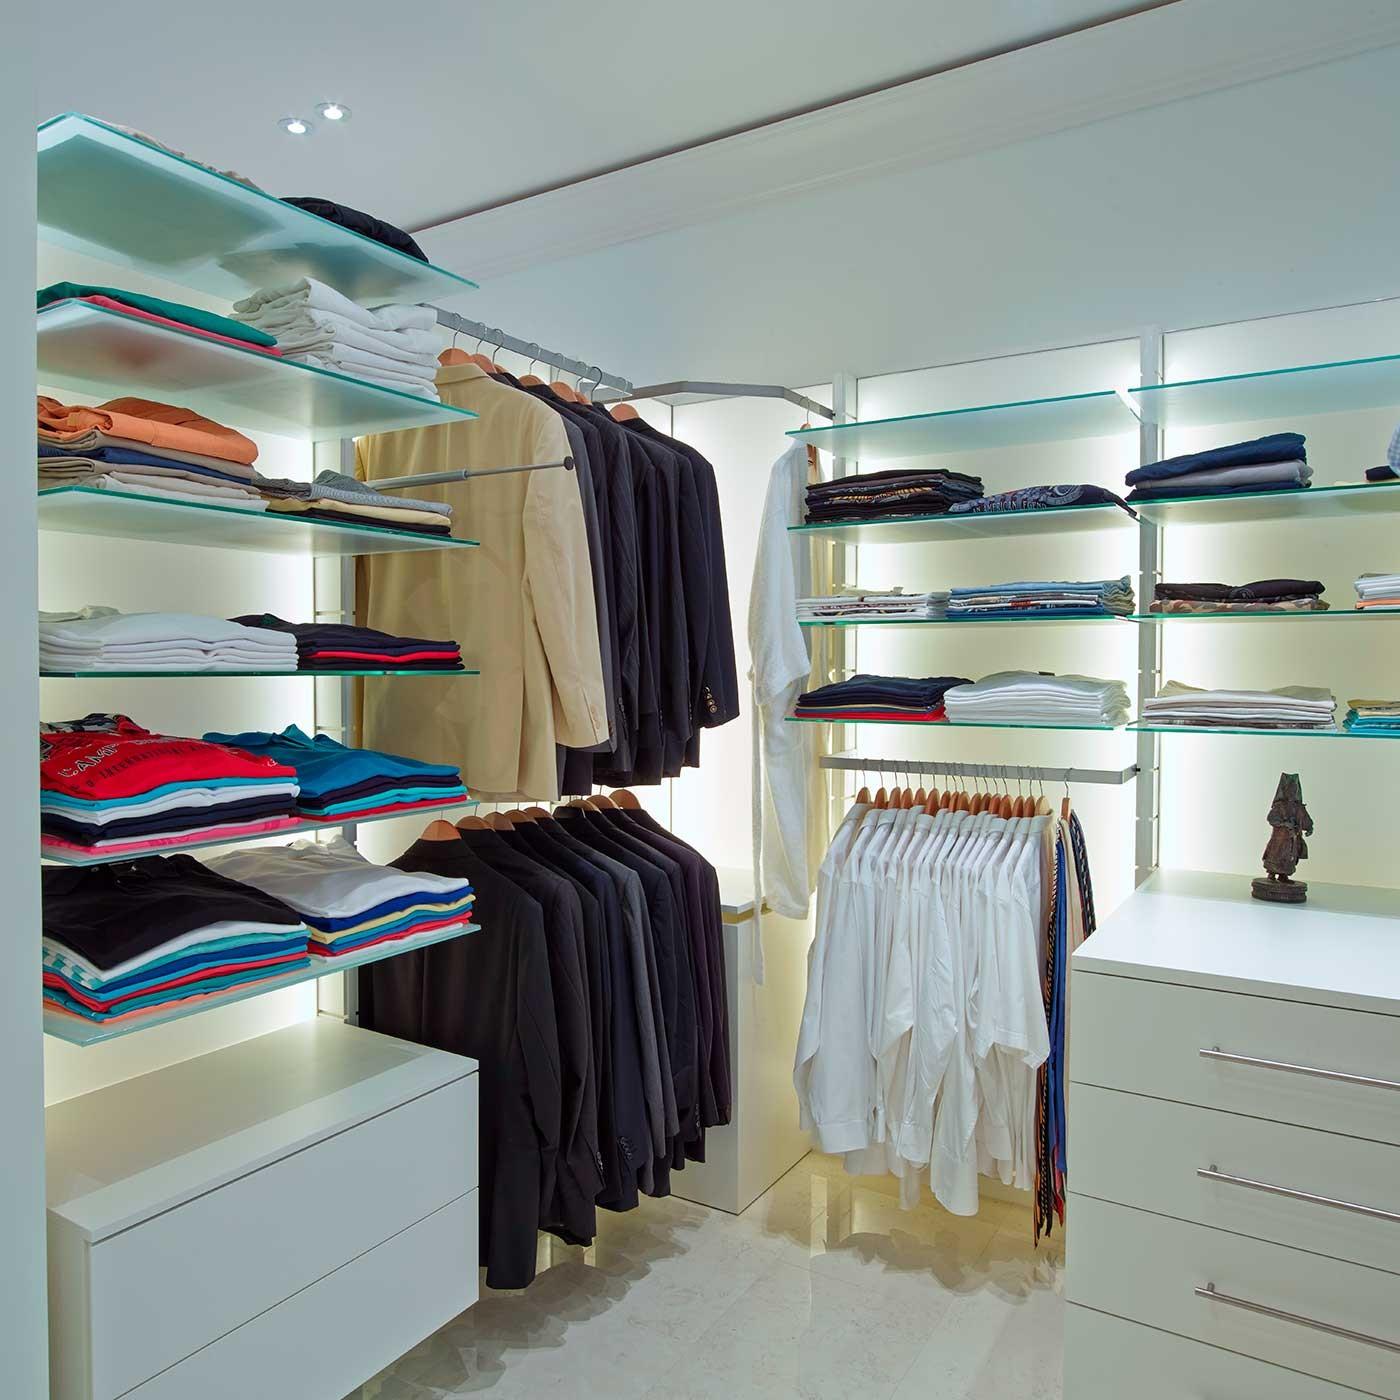 begehbarer kleiderschrank walk in prime iii 324 ma 324 x 215 2 x 45 cm b x h x t. Black Bedroom Furniture Sets. Home Design Ideas